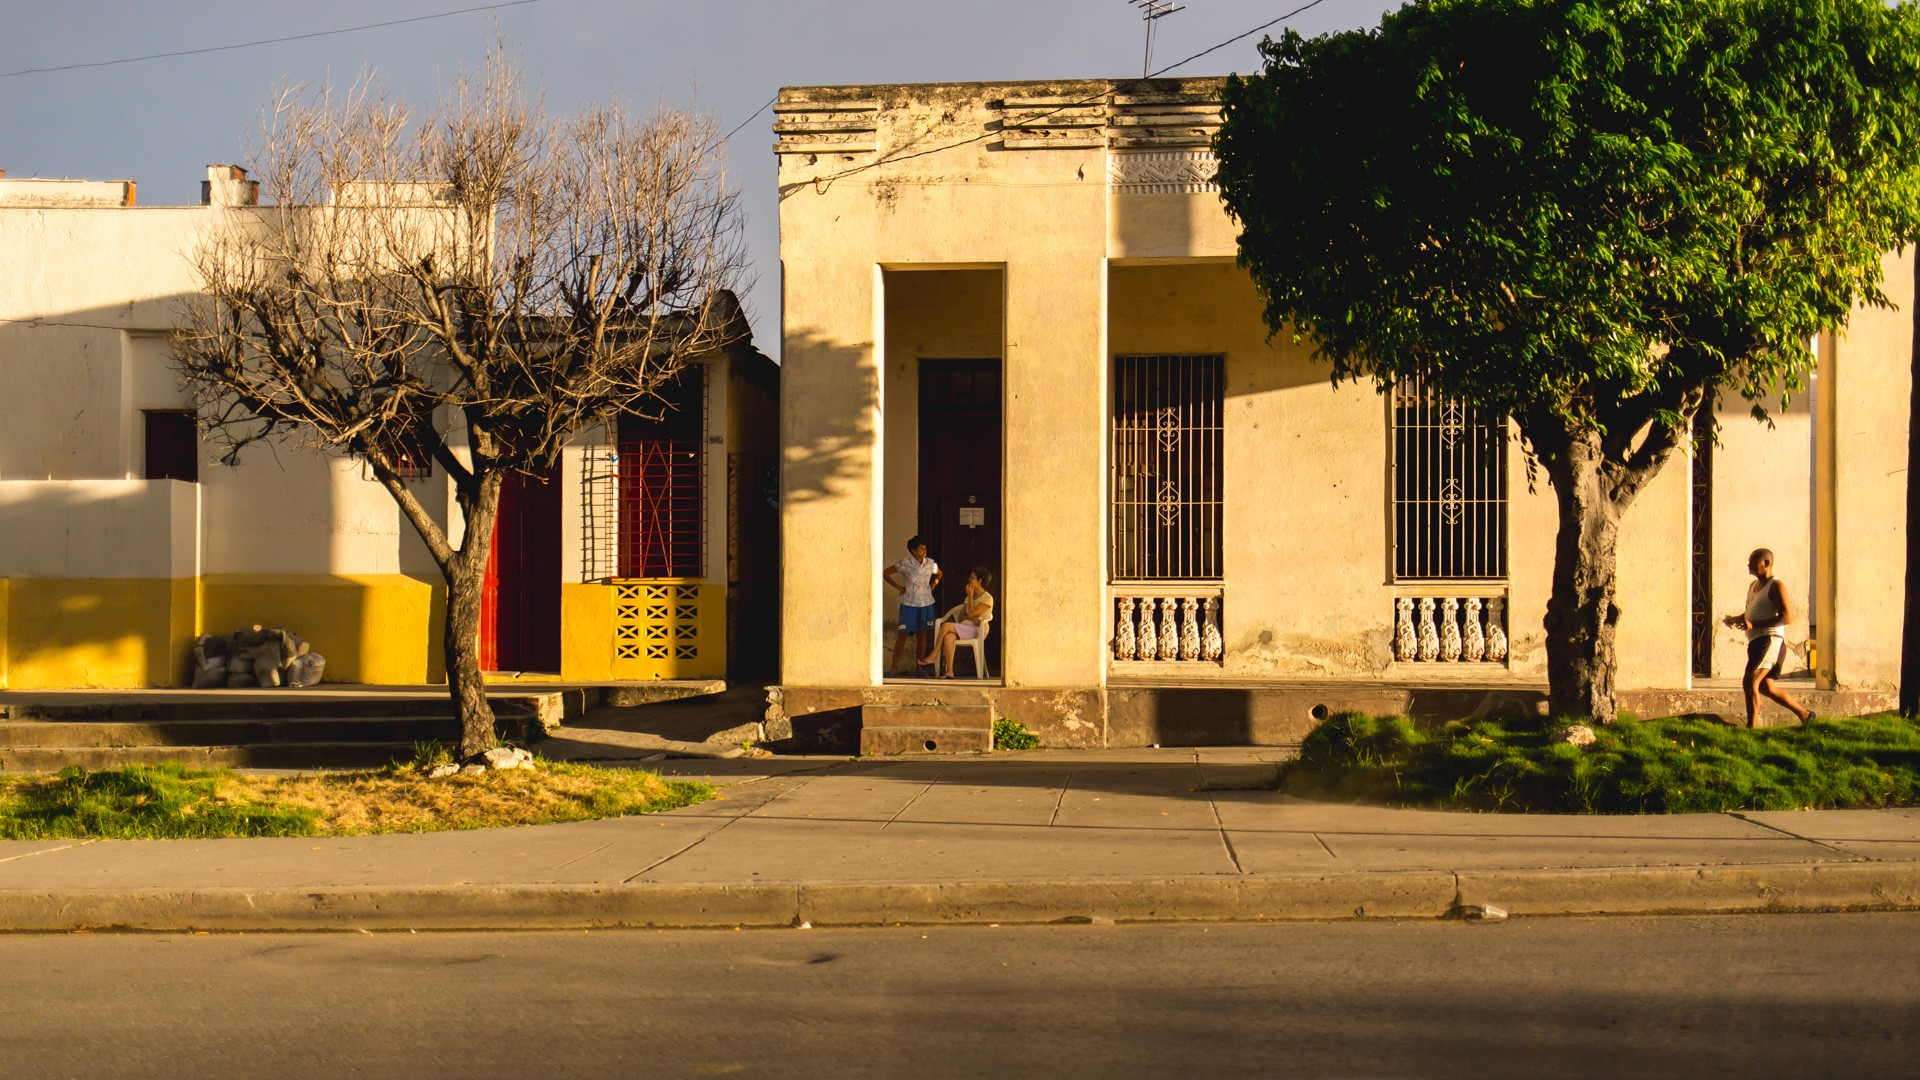 Damien-Dohmen-Photographe-Cuba-42